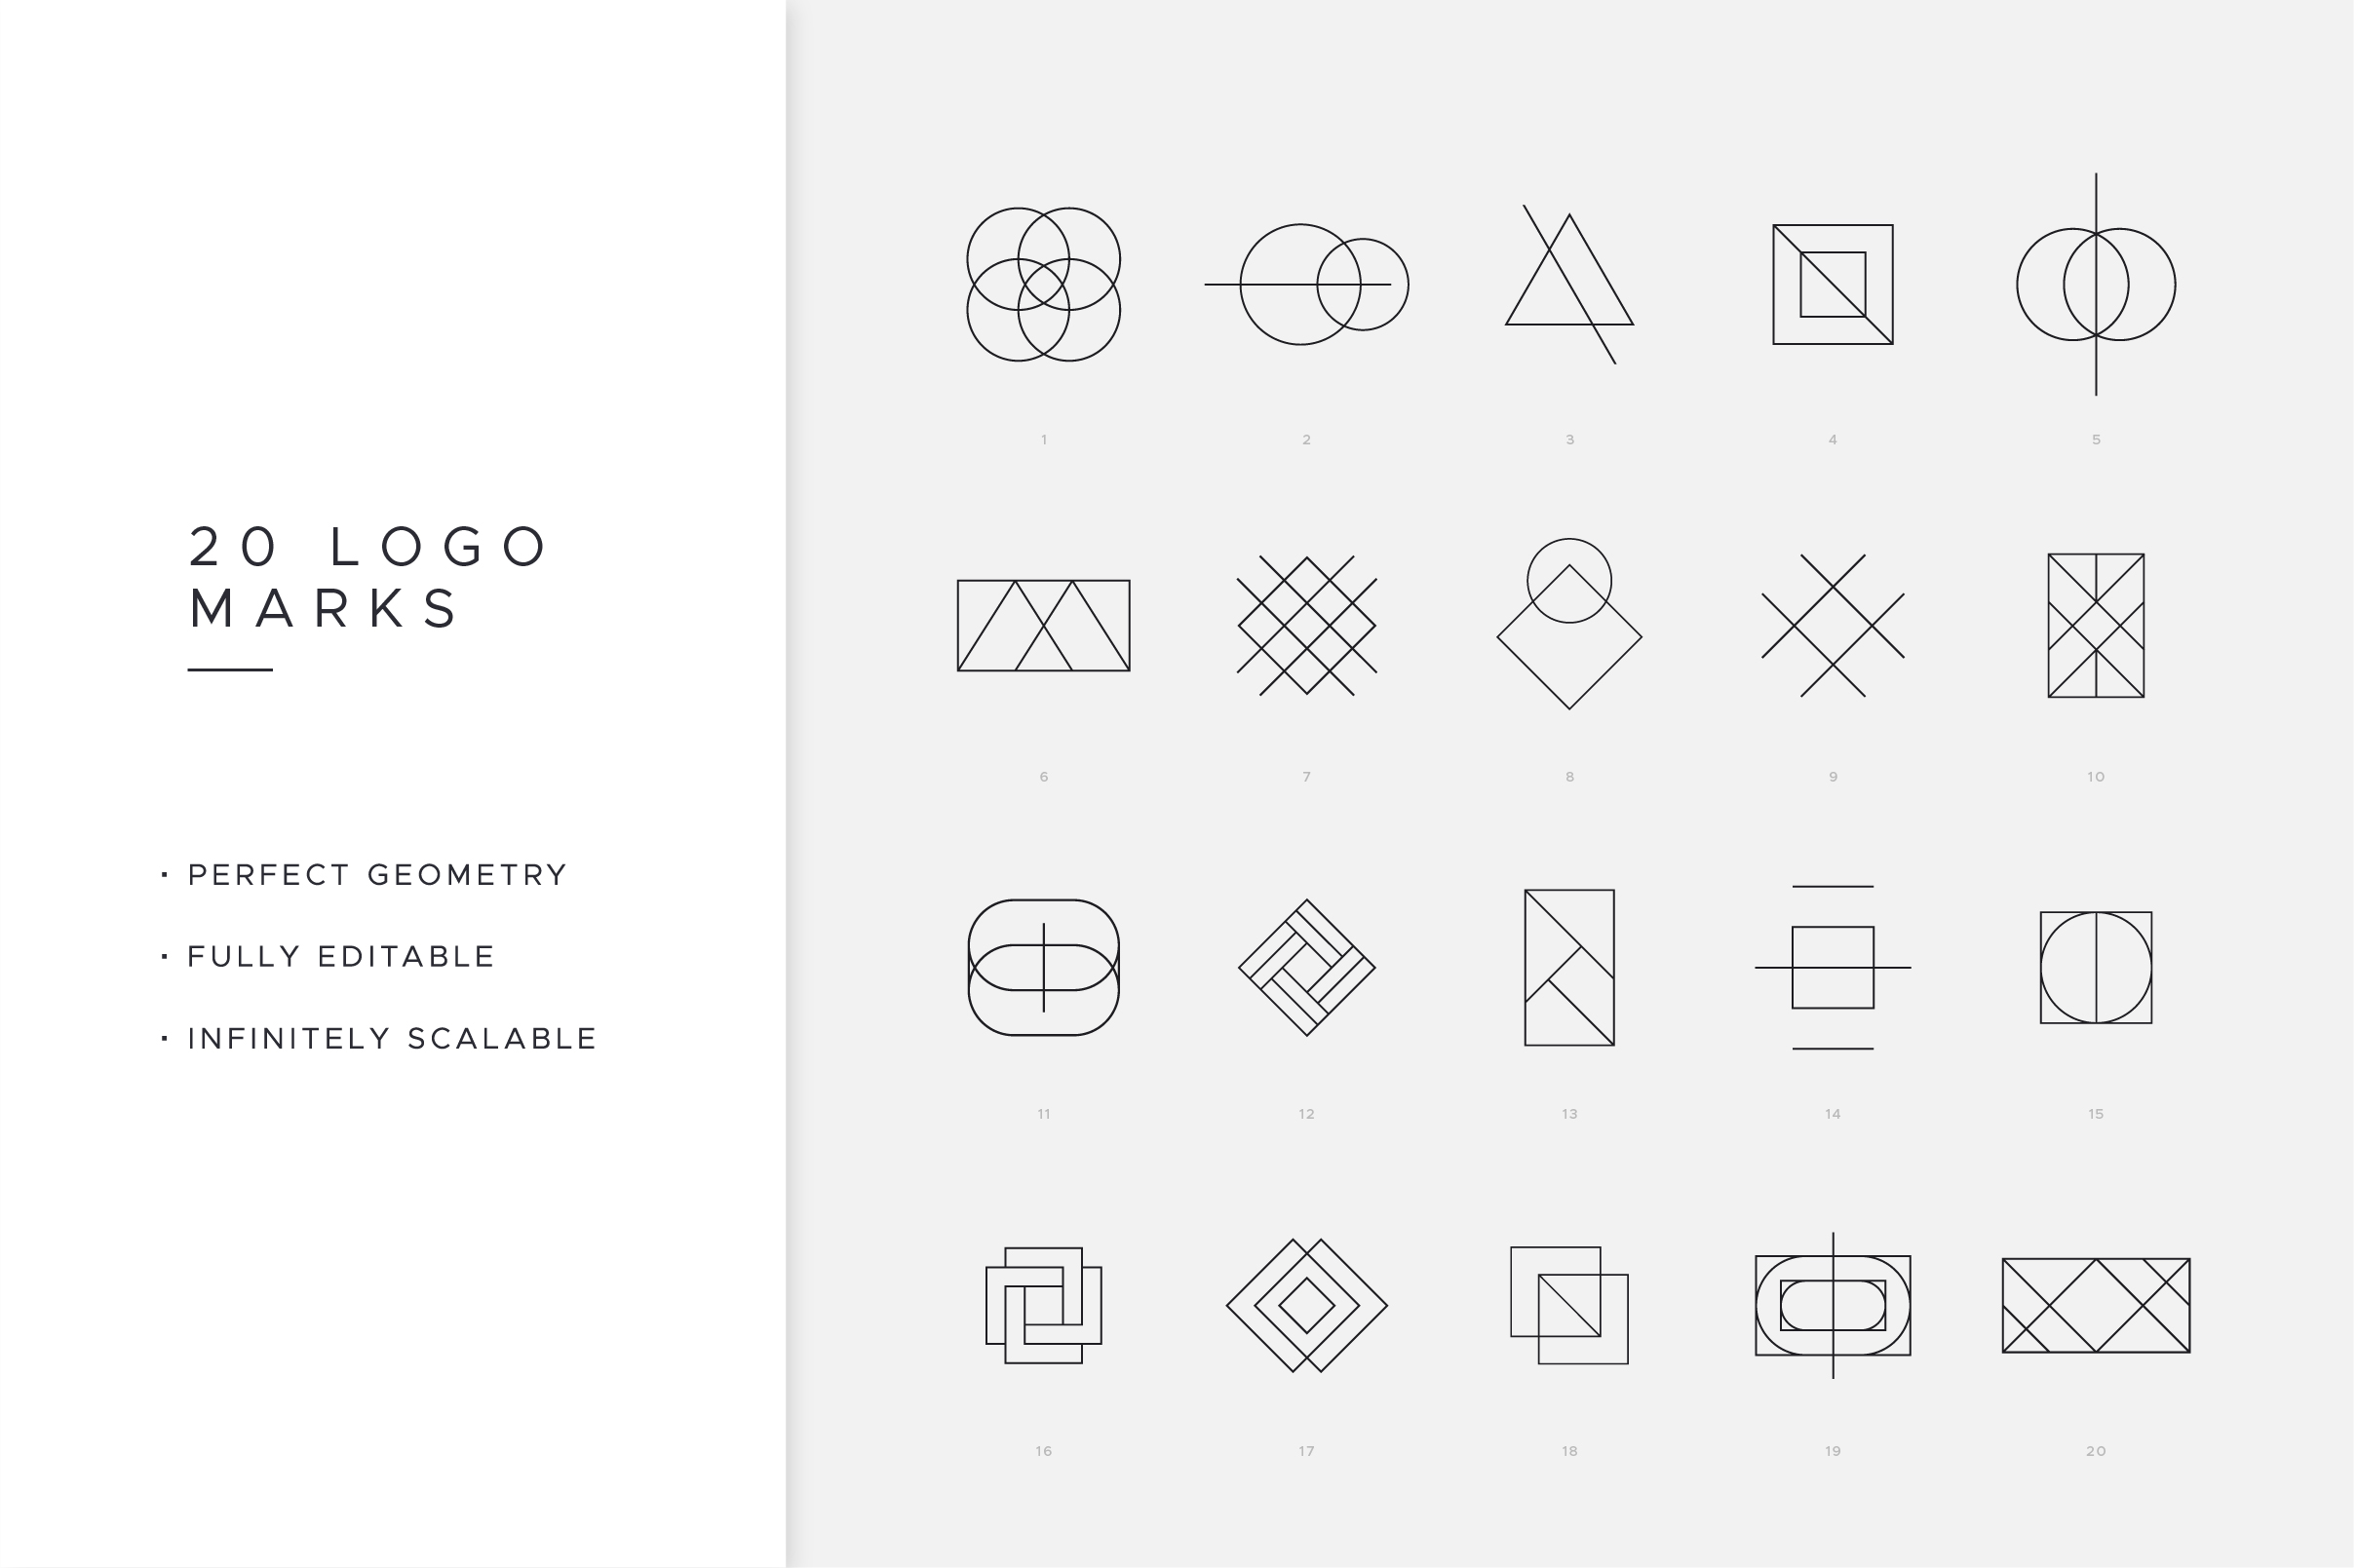 Minimal Geometric Logos - Volume 2 example image 3